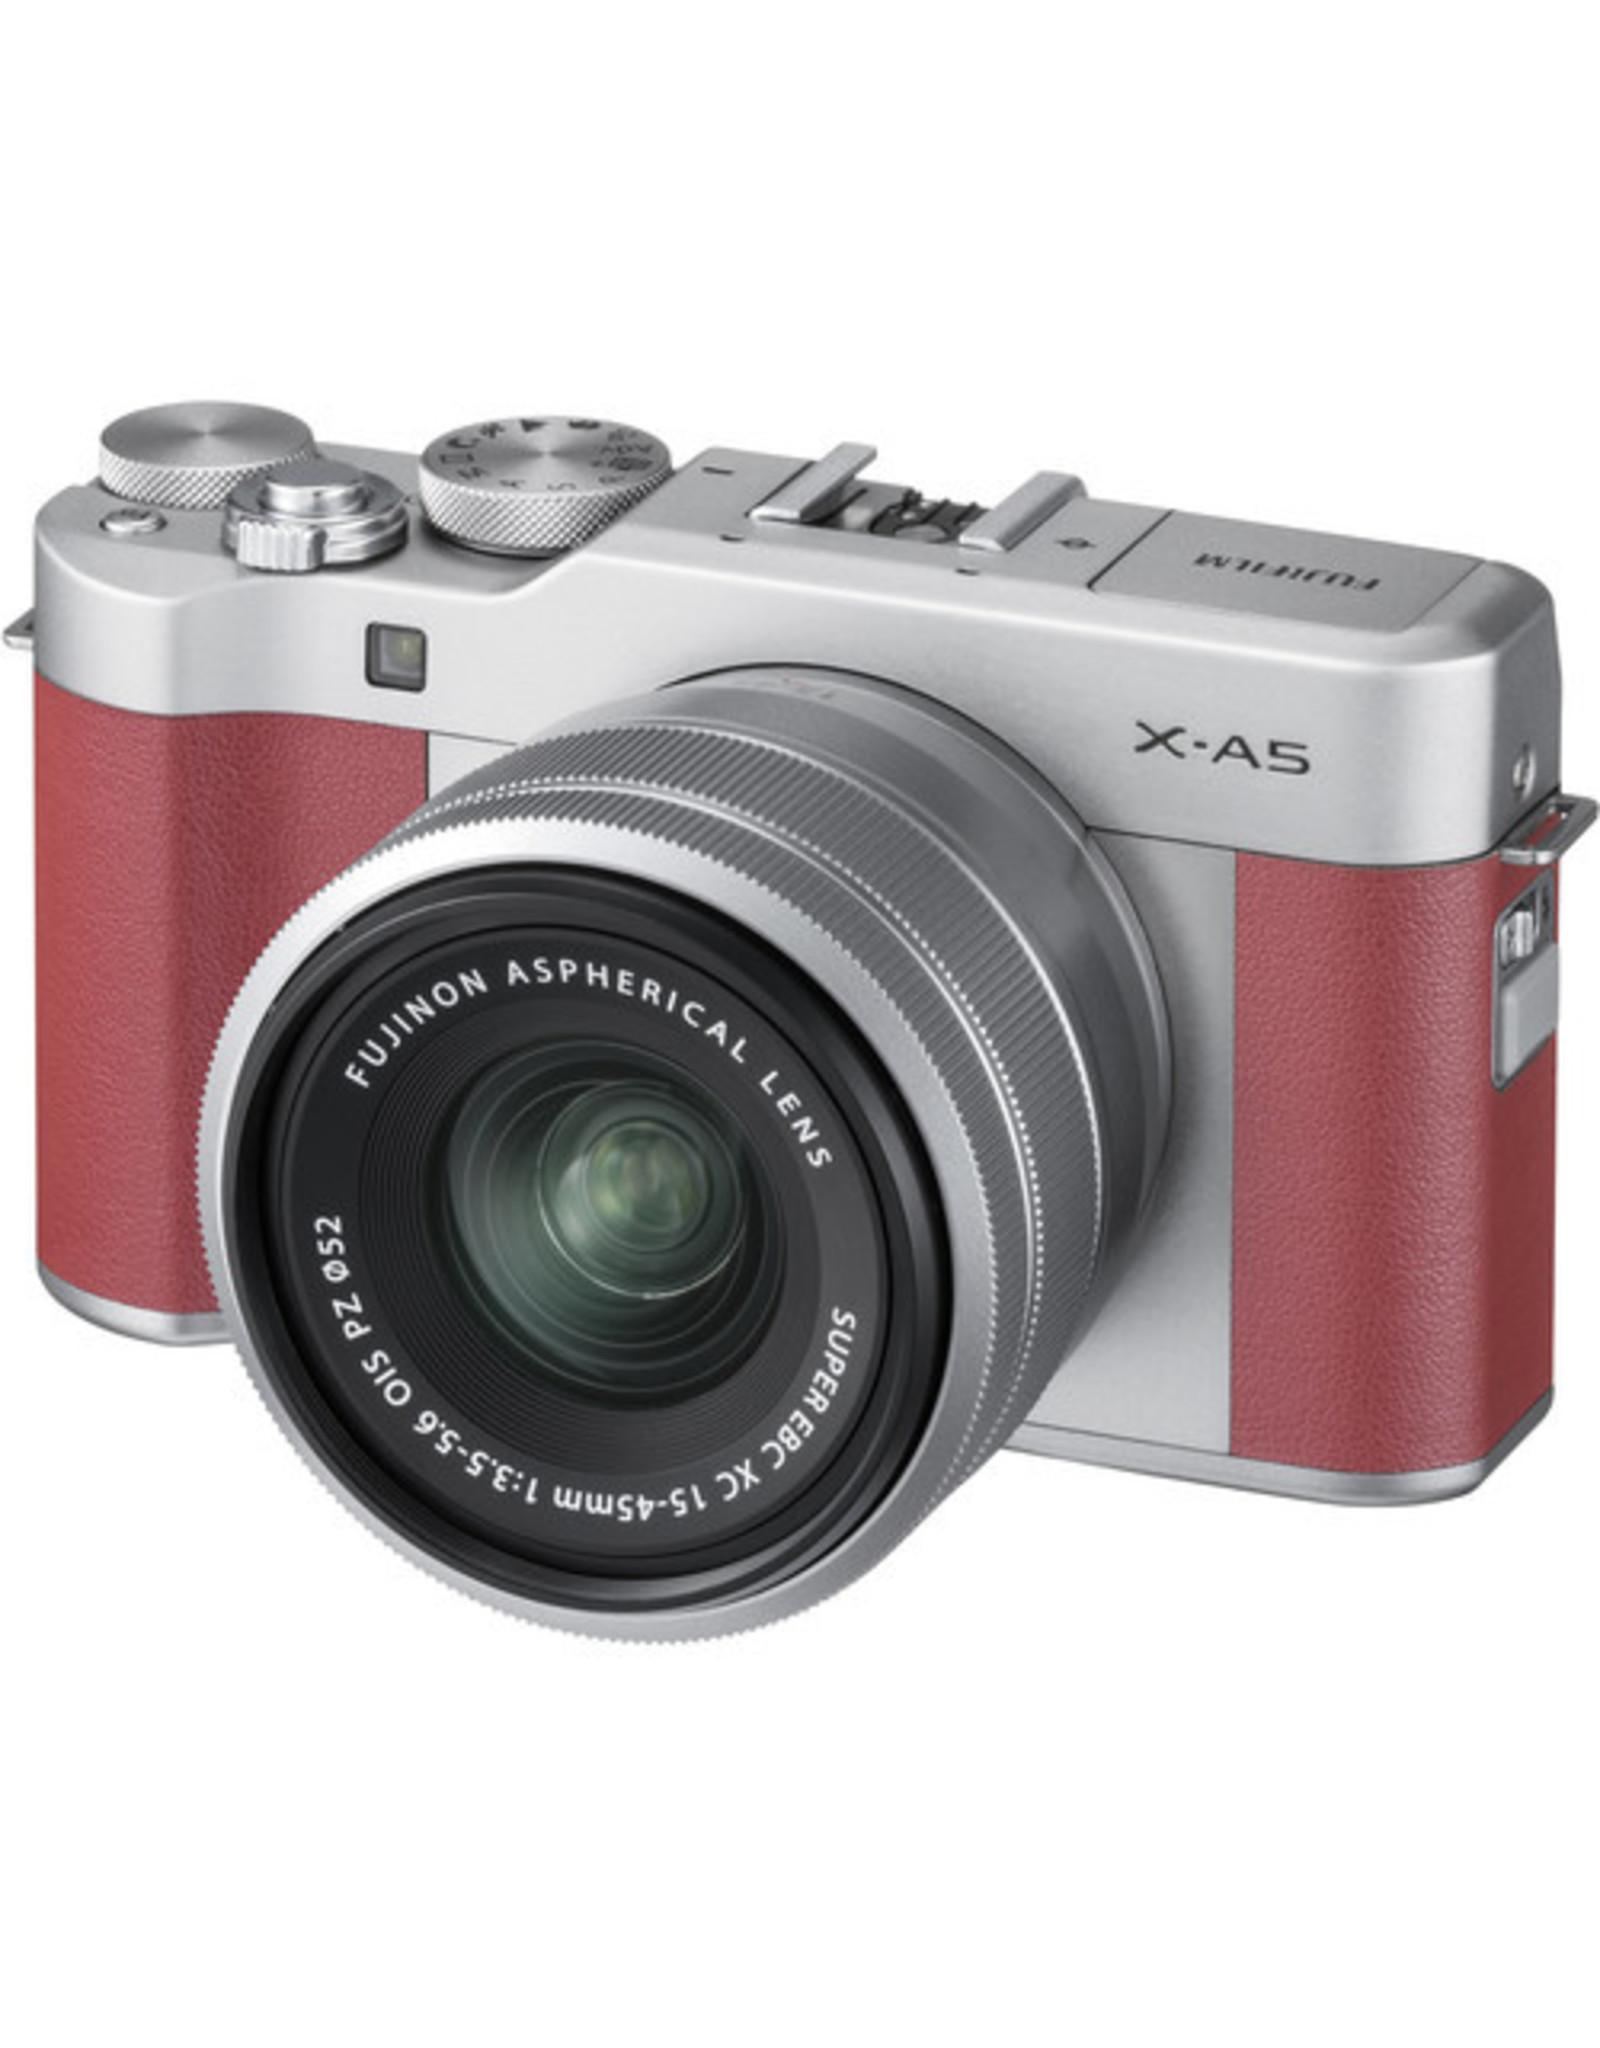 Fuji FUJIFILM X-A5 Mirrorless Digital Camera with 15-45mm Lens (Pink)